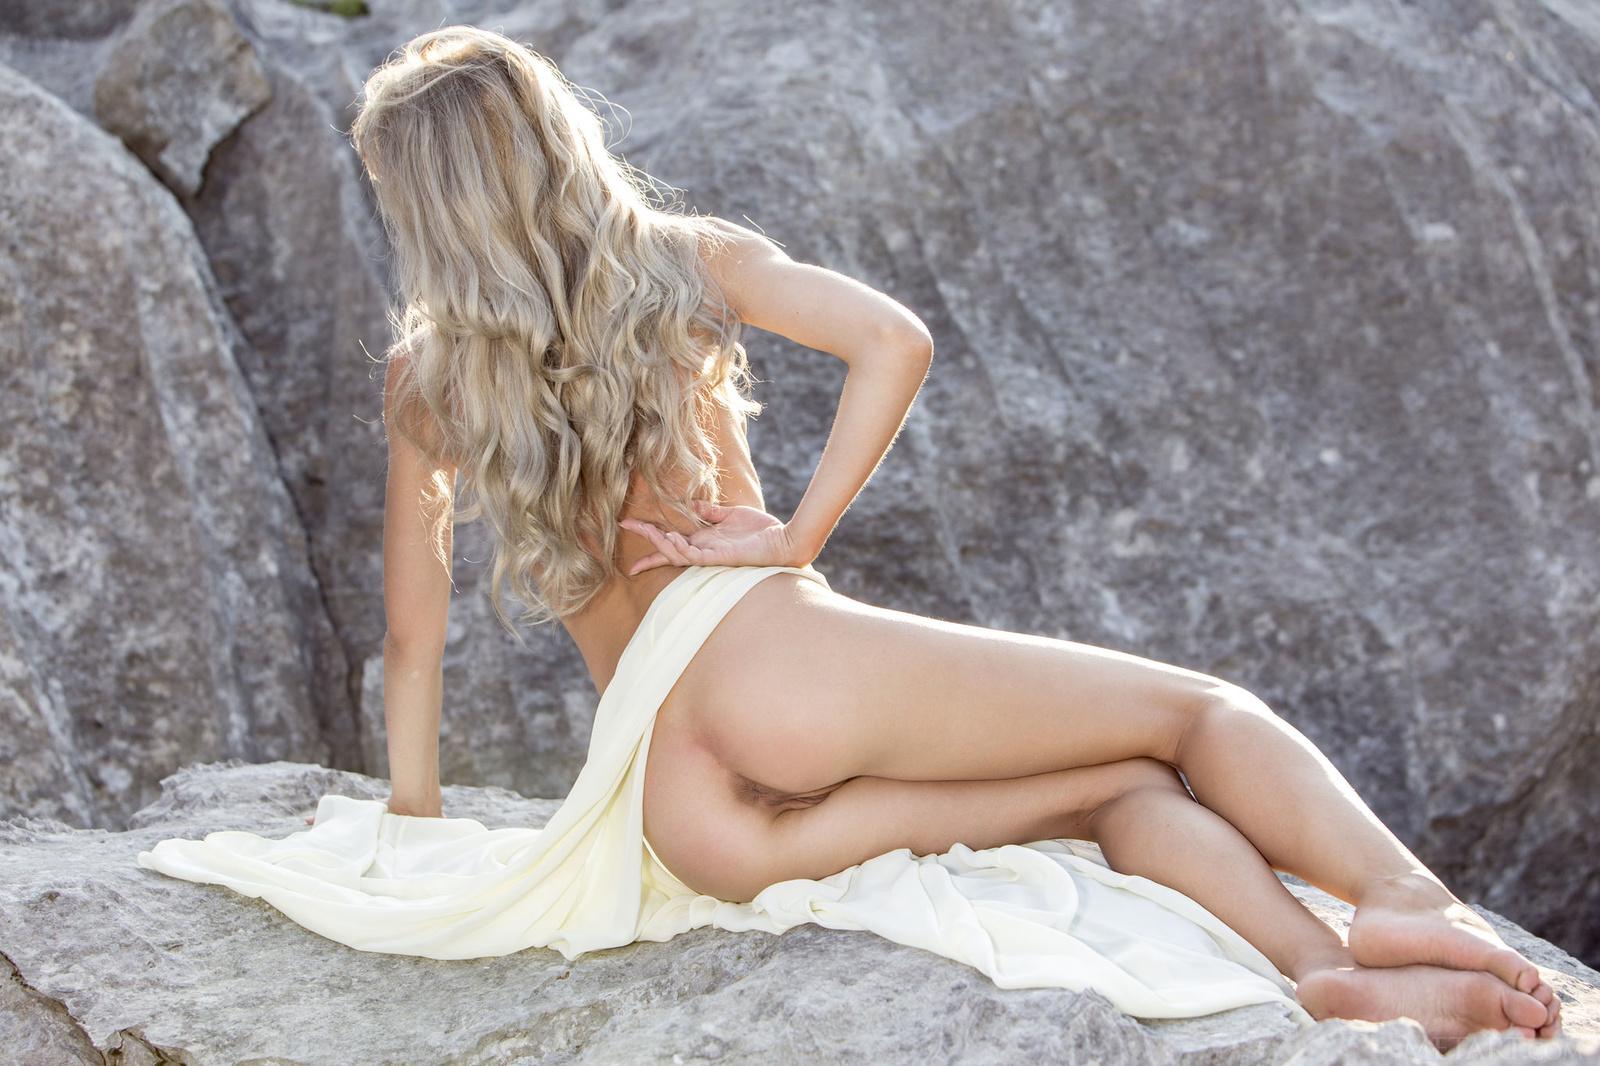 Zdjęcie porno - 07 - Suczka na skale